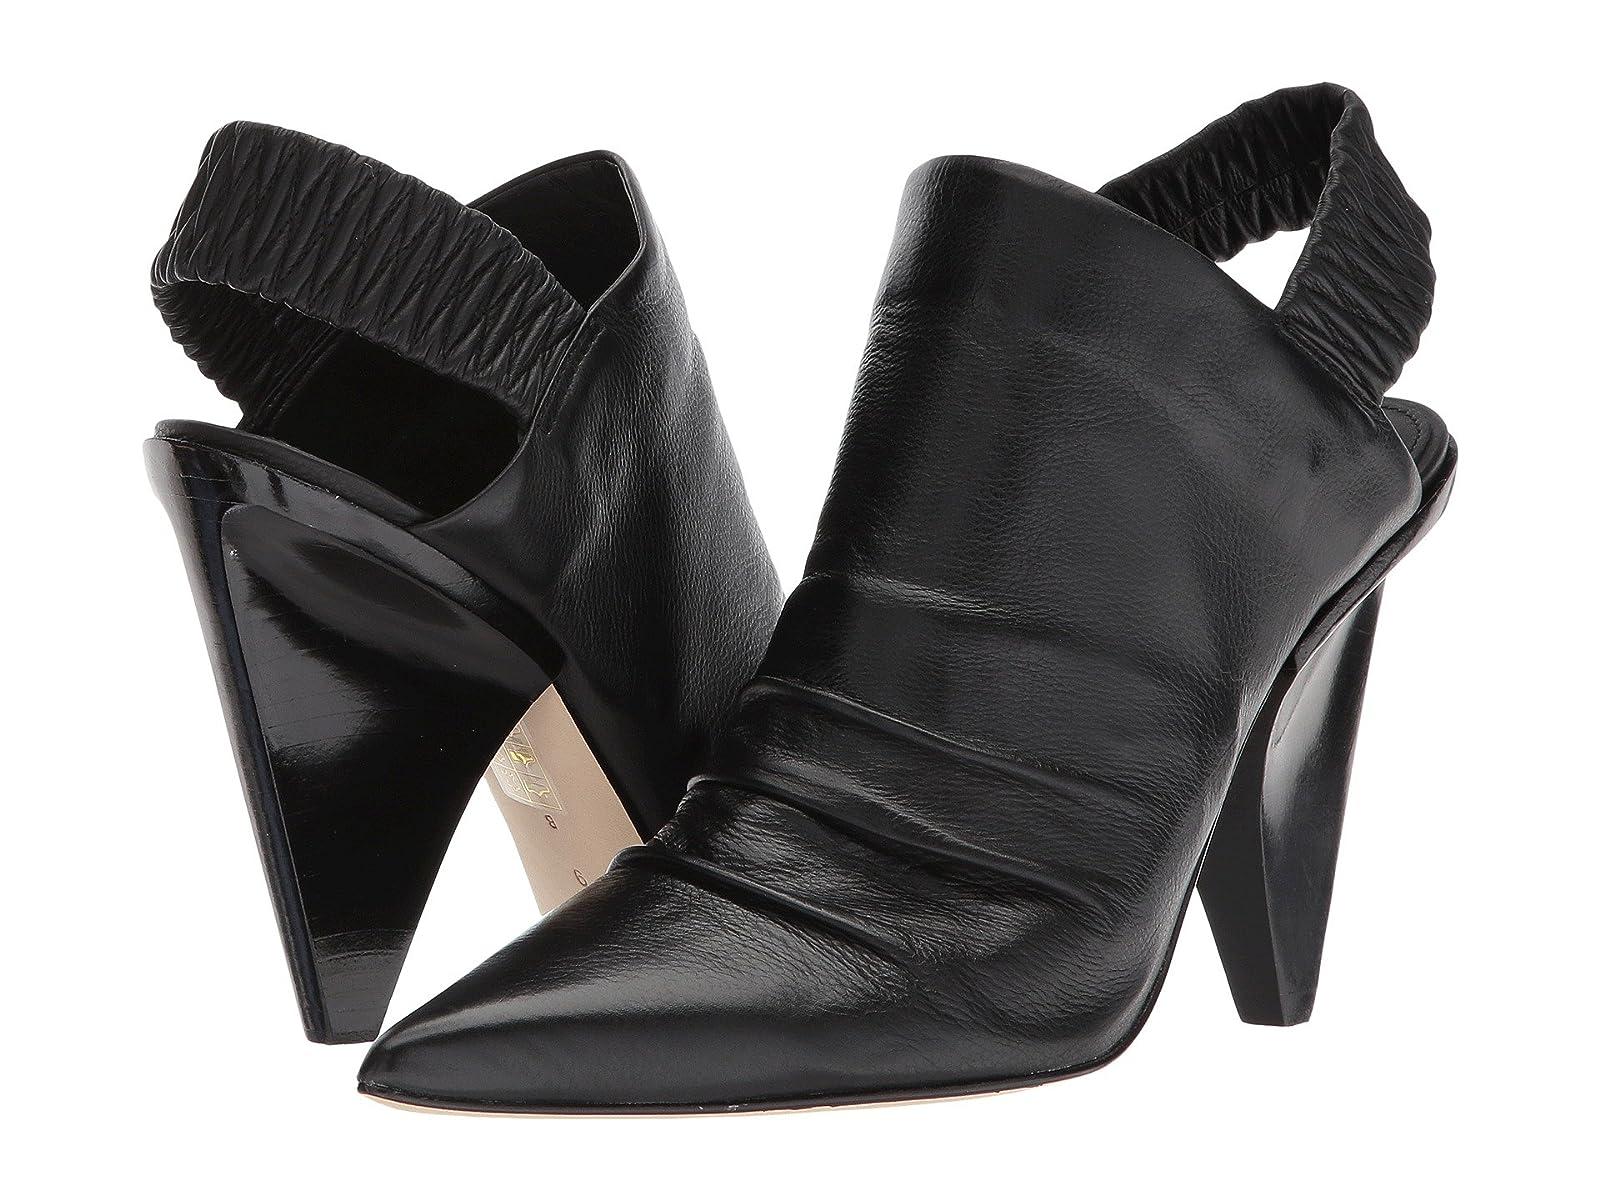 Sigerson Morrison JeanieAtmospheric grades have affordable shoes